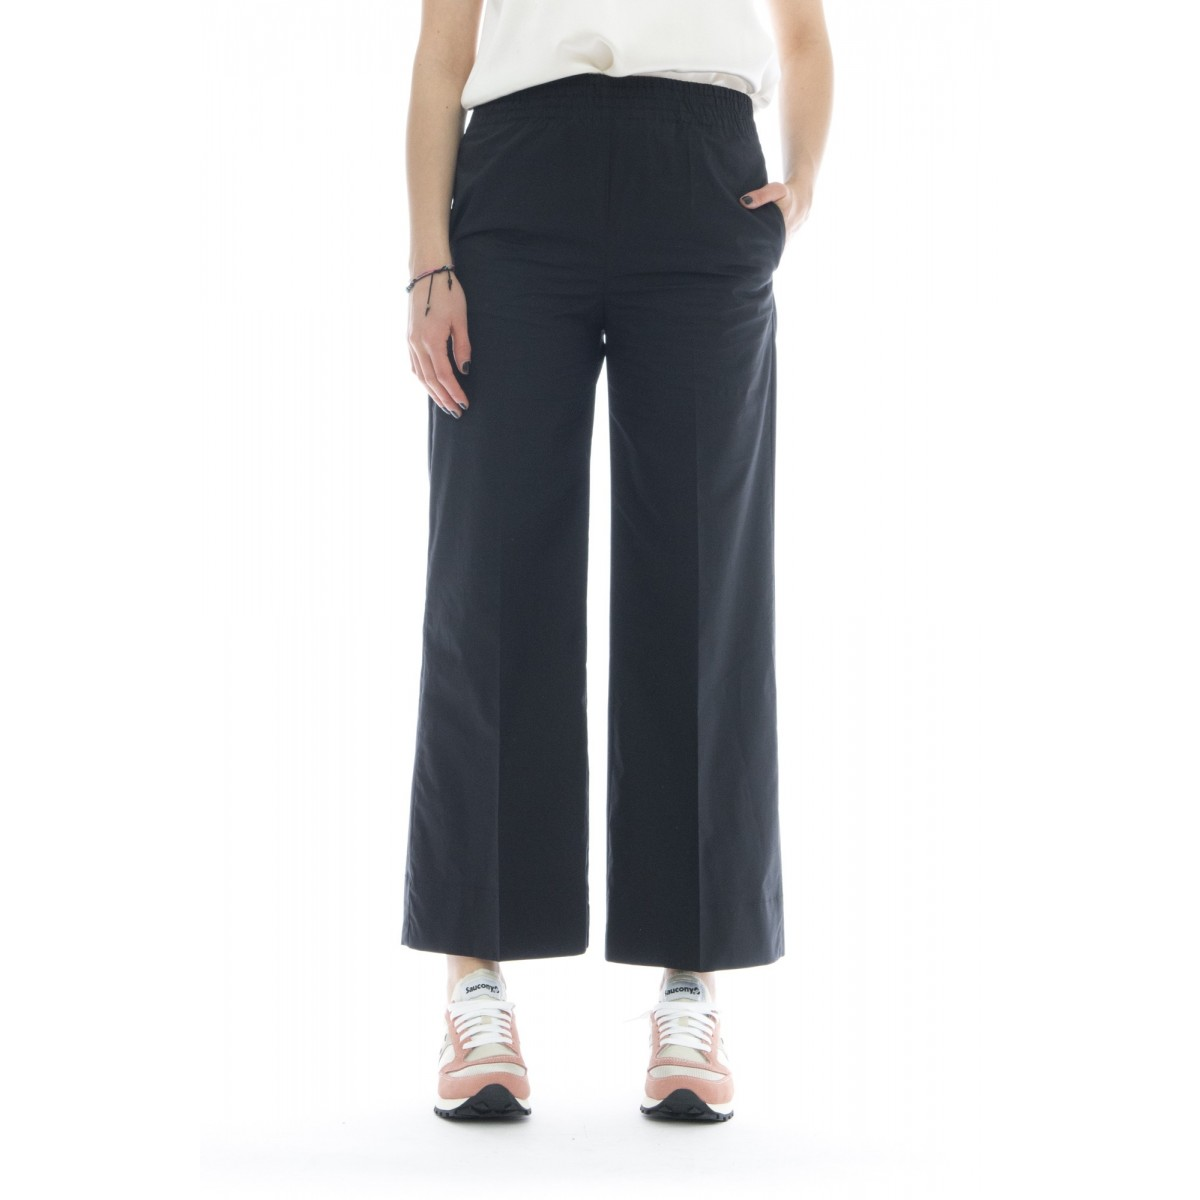 Pantalone donna - J4033 pantalone cotone